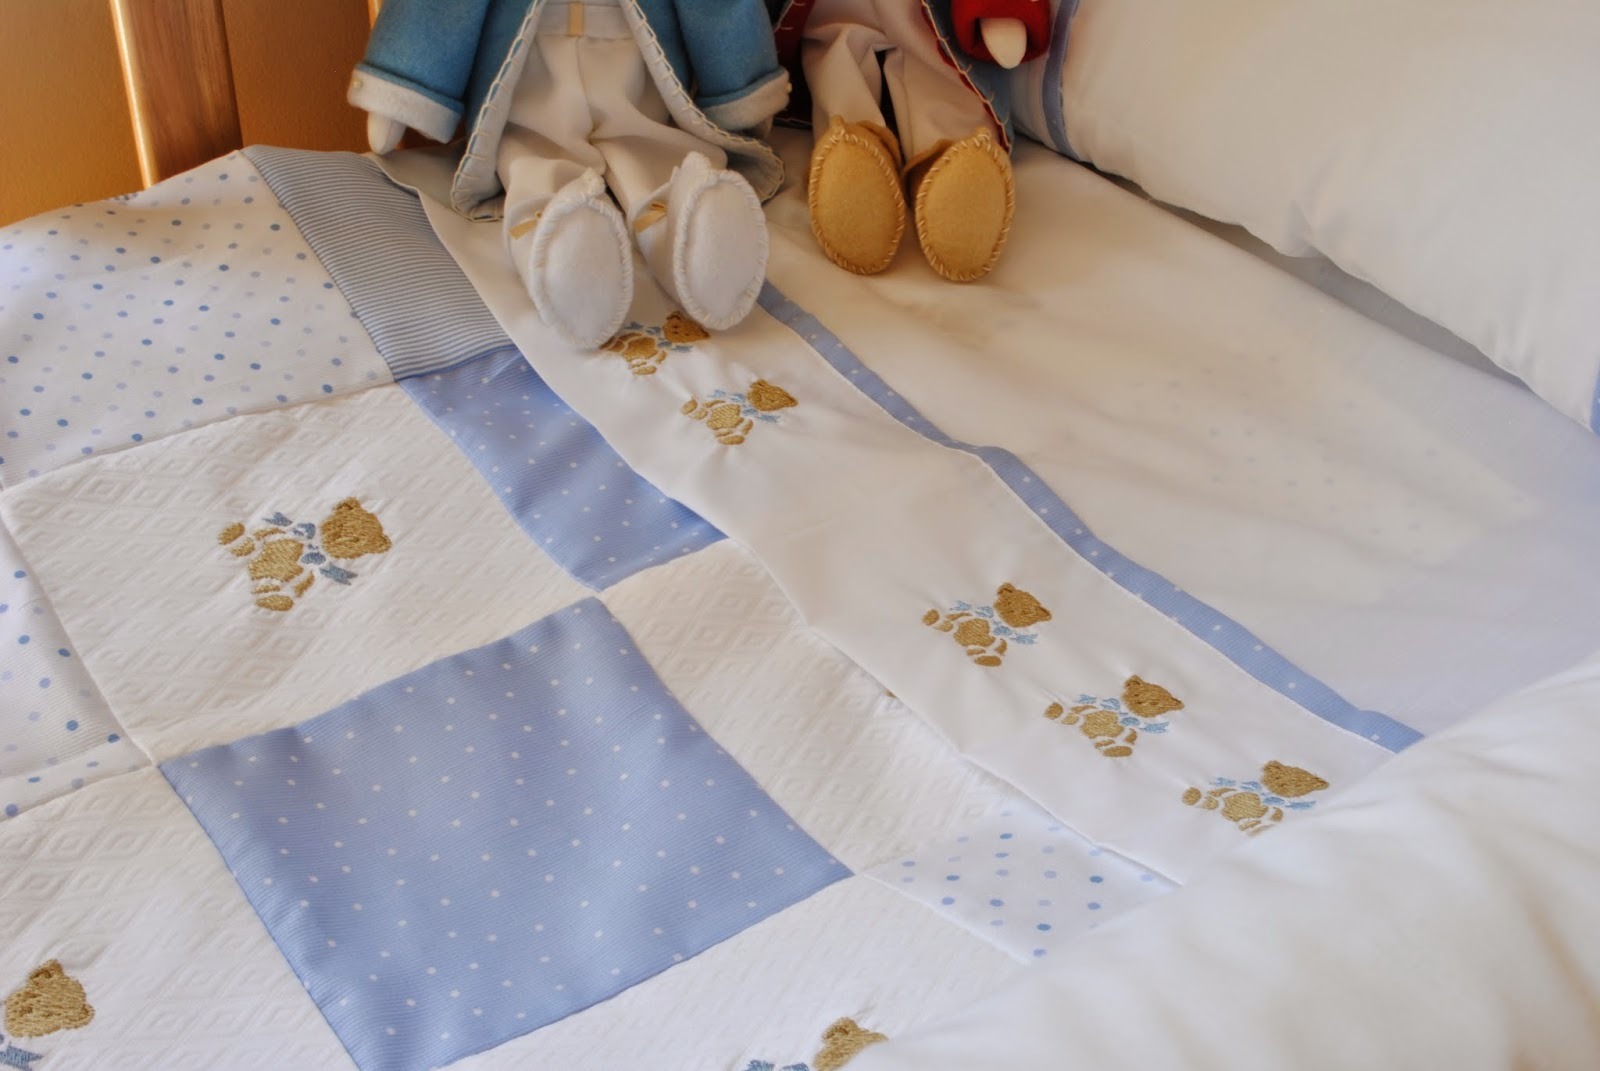 Paz montealegre decoraci n s banas bordadas para ni os - Sabanas de ninos ...